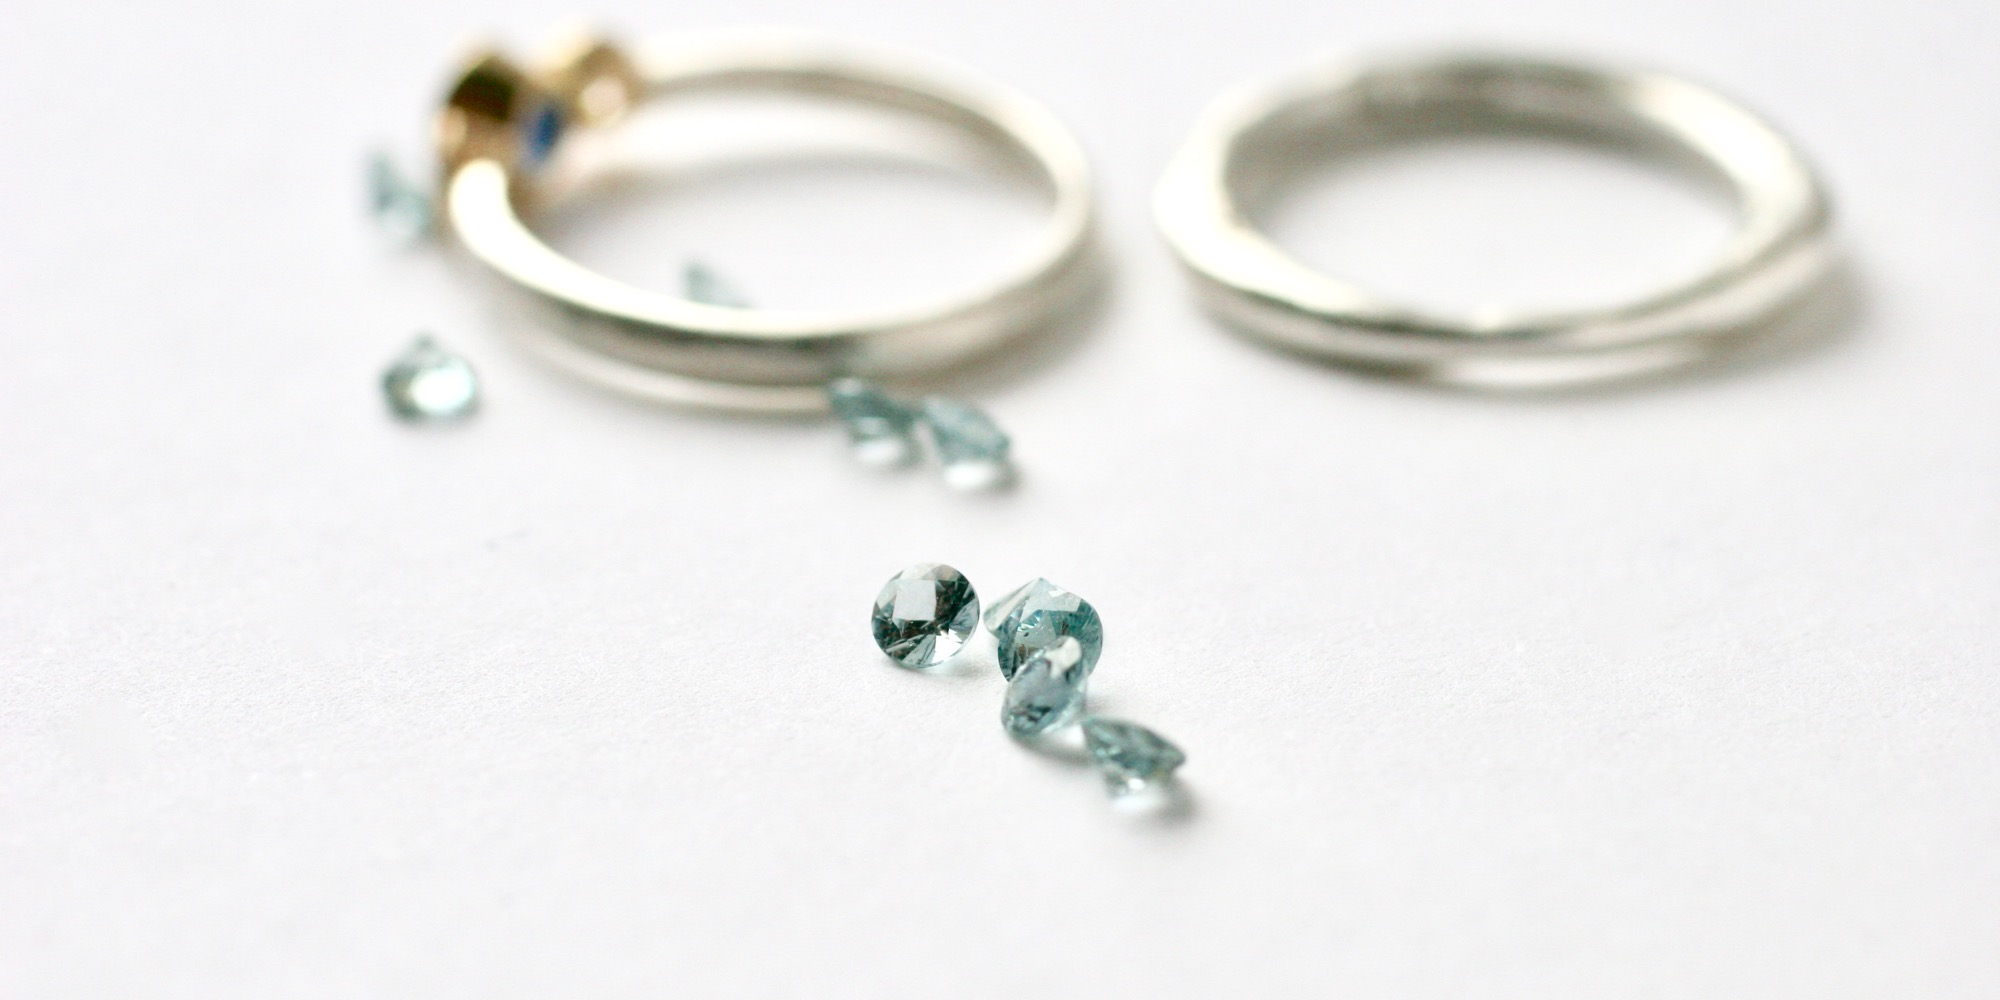 Benner-Ethical-malawi-teal-sapphires-glasswing-engagement-ring (1).jpg